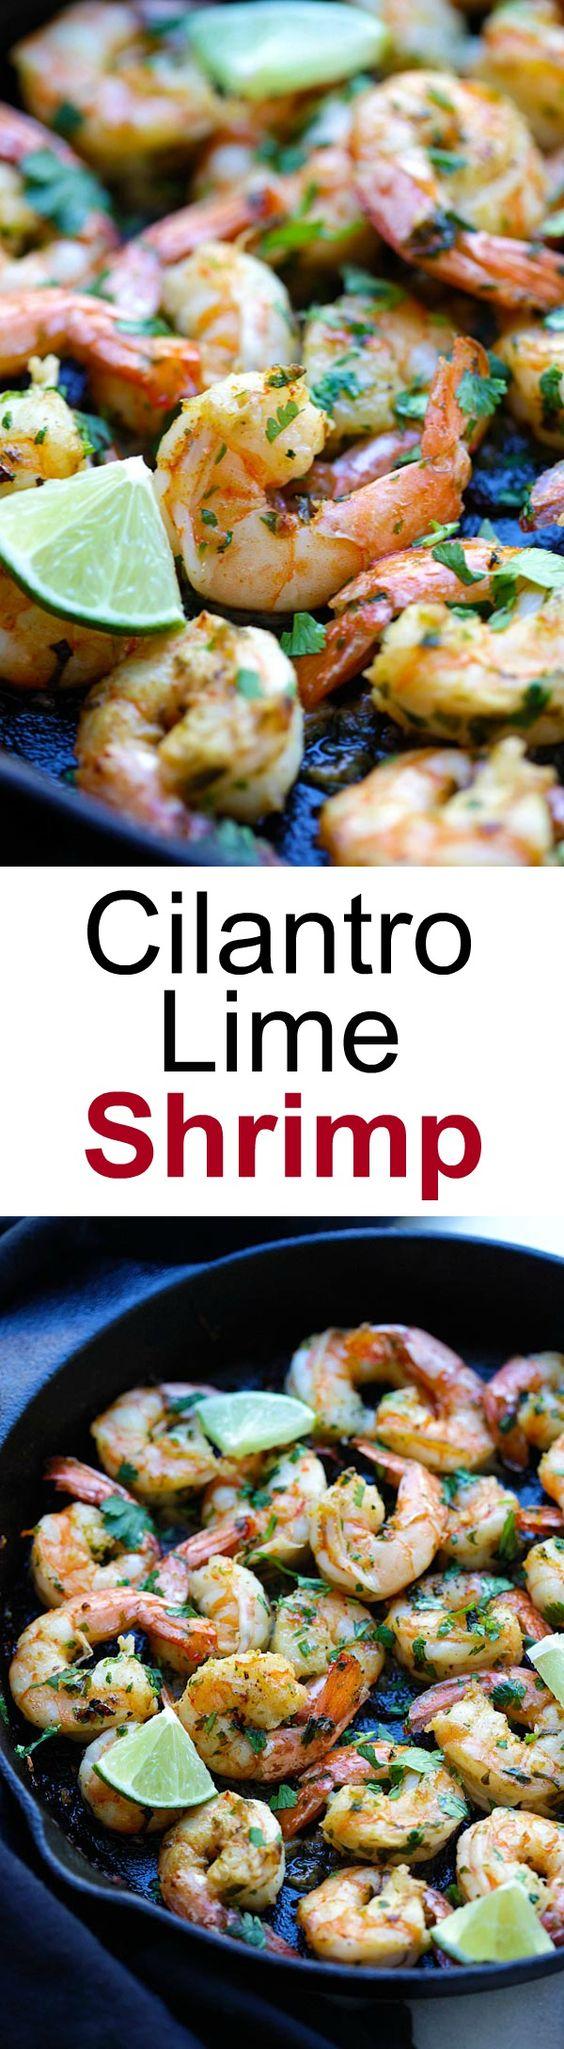 Shrimp And Avocado Salad With Edamame, Cilantro, Chipotle, And Lime ...